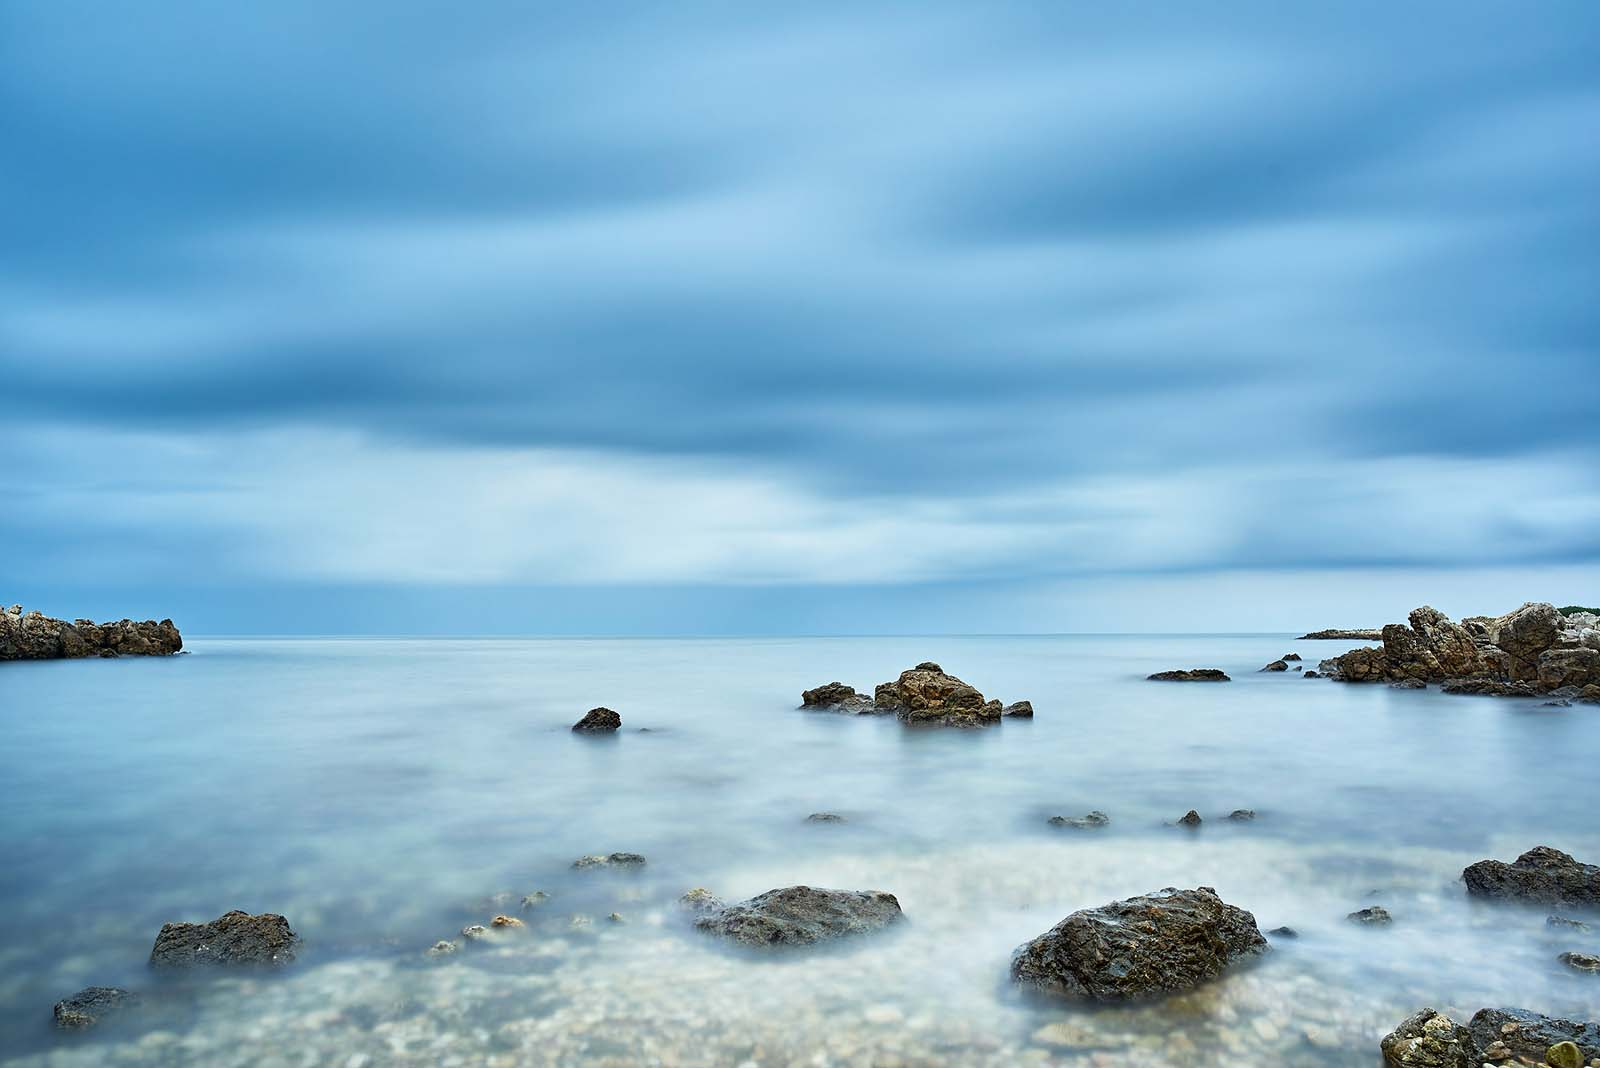 Antibes, Cote d'Azur: Vor dem Sturm. Originalgröße 105x70 cm | © Reinhard Podolsky